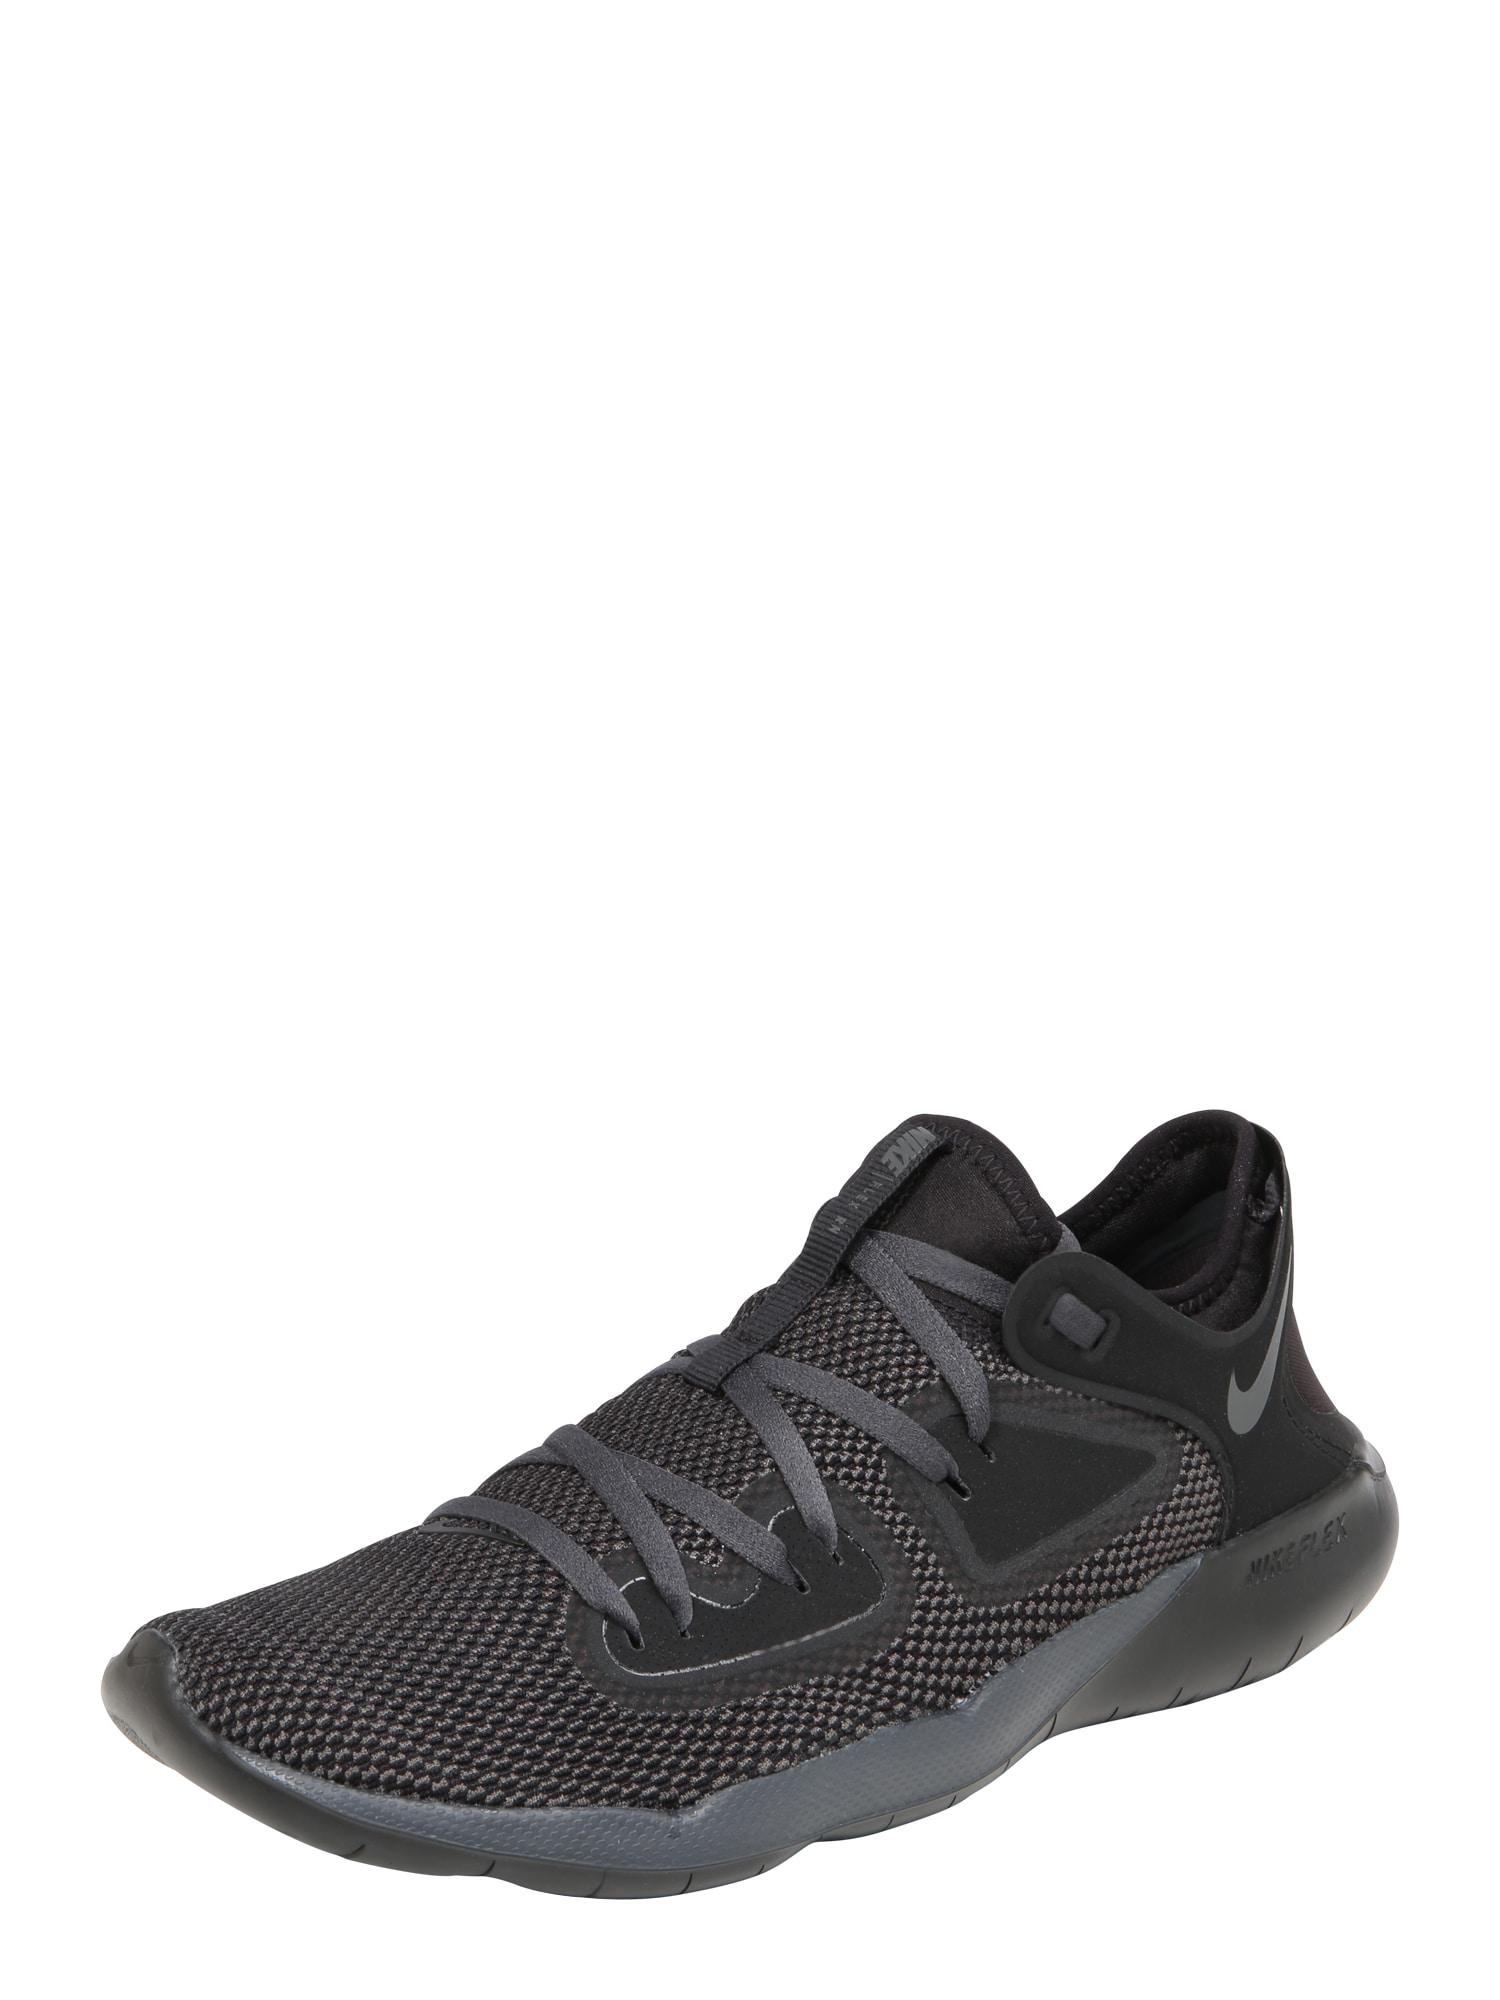 Běžecká obuv Nike Flex 2019 RN černá NIKE